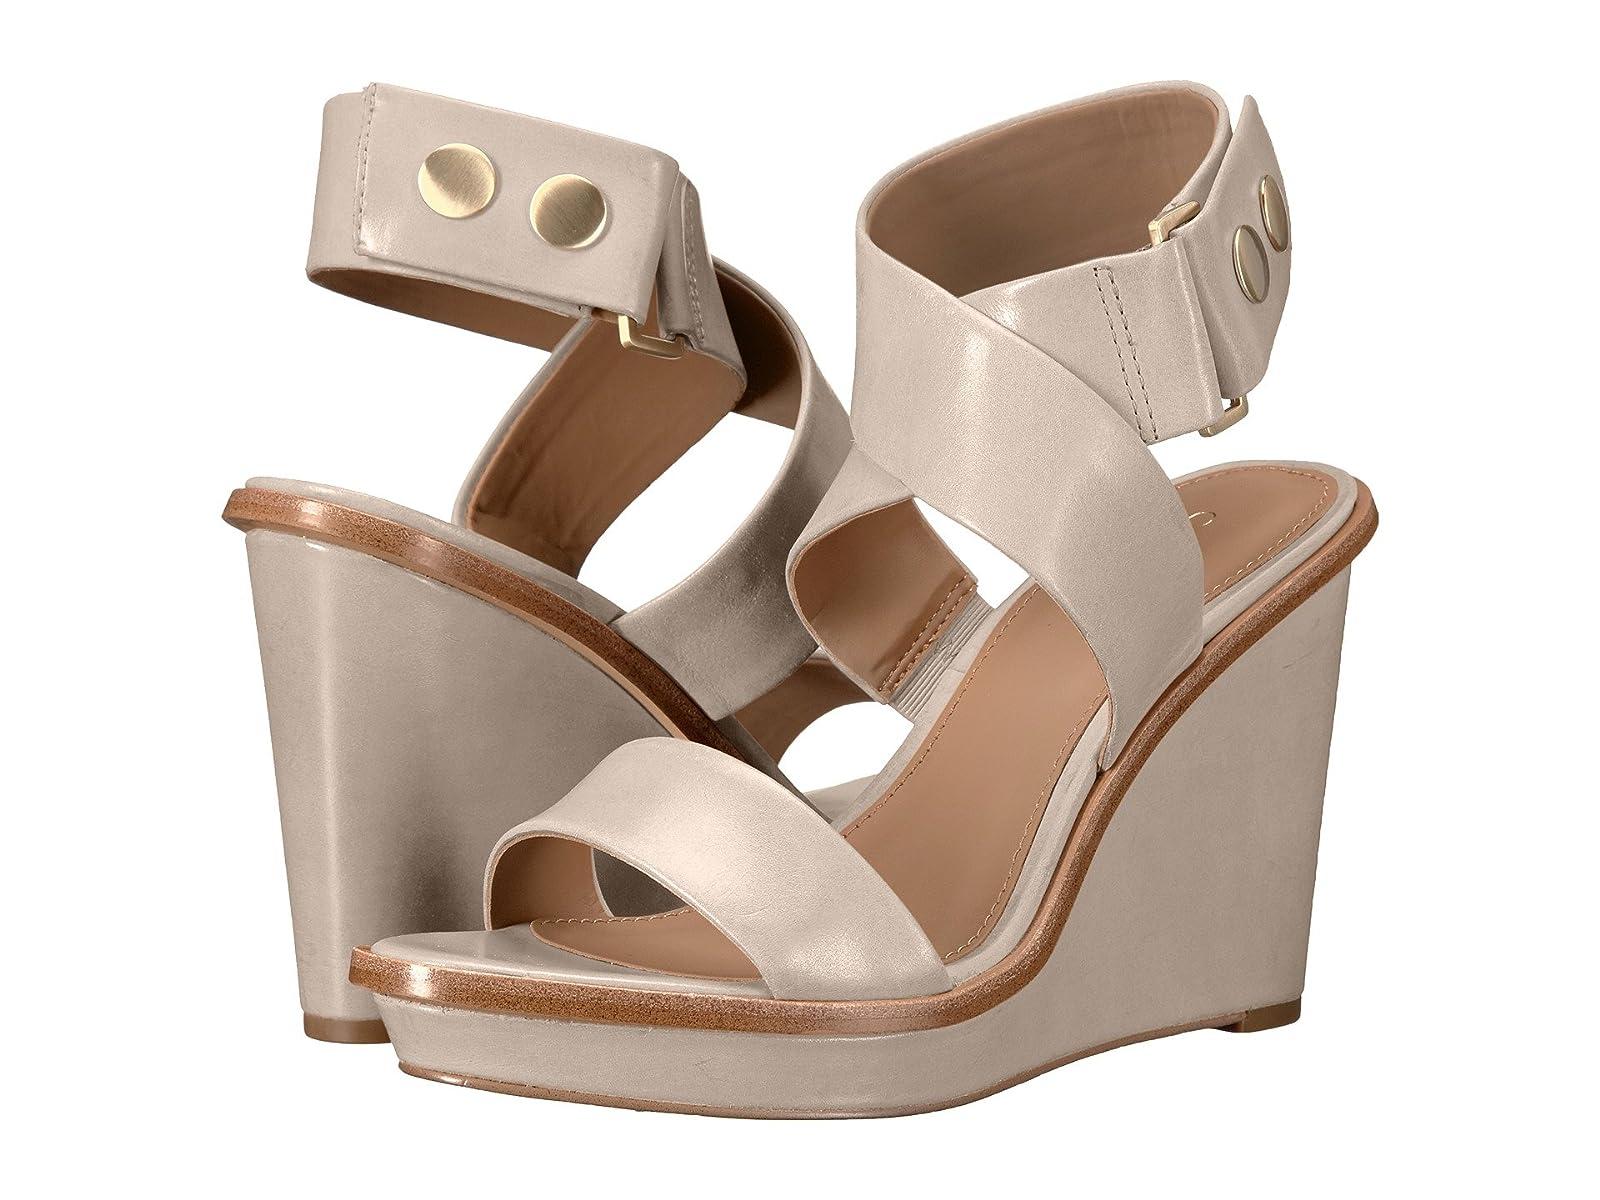 Calvin Klein PerninaCheap and distinctive eye-catching shoes